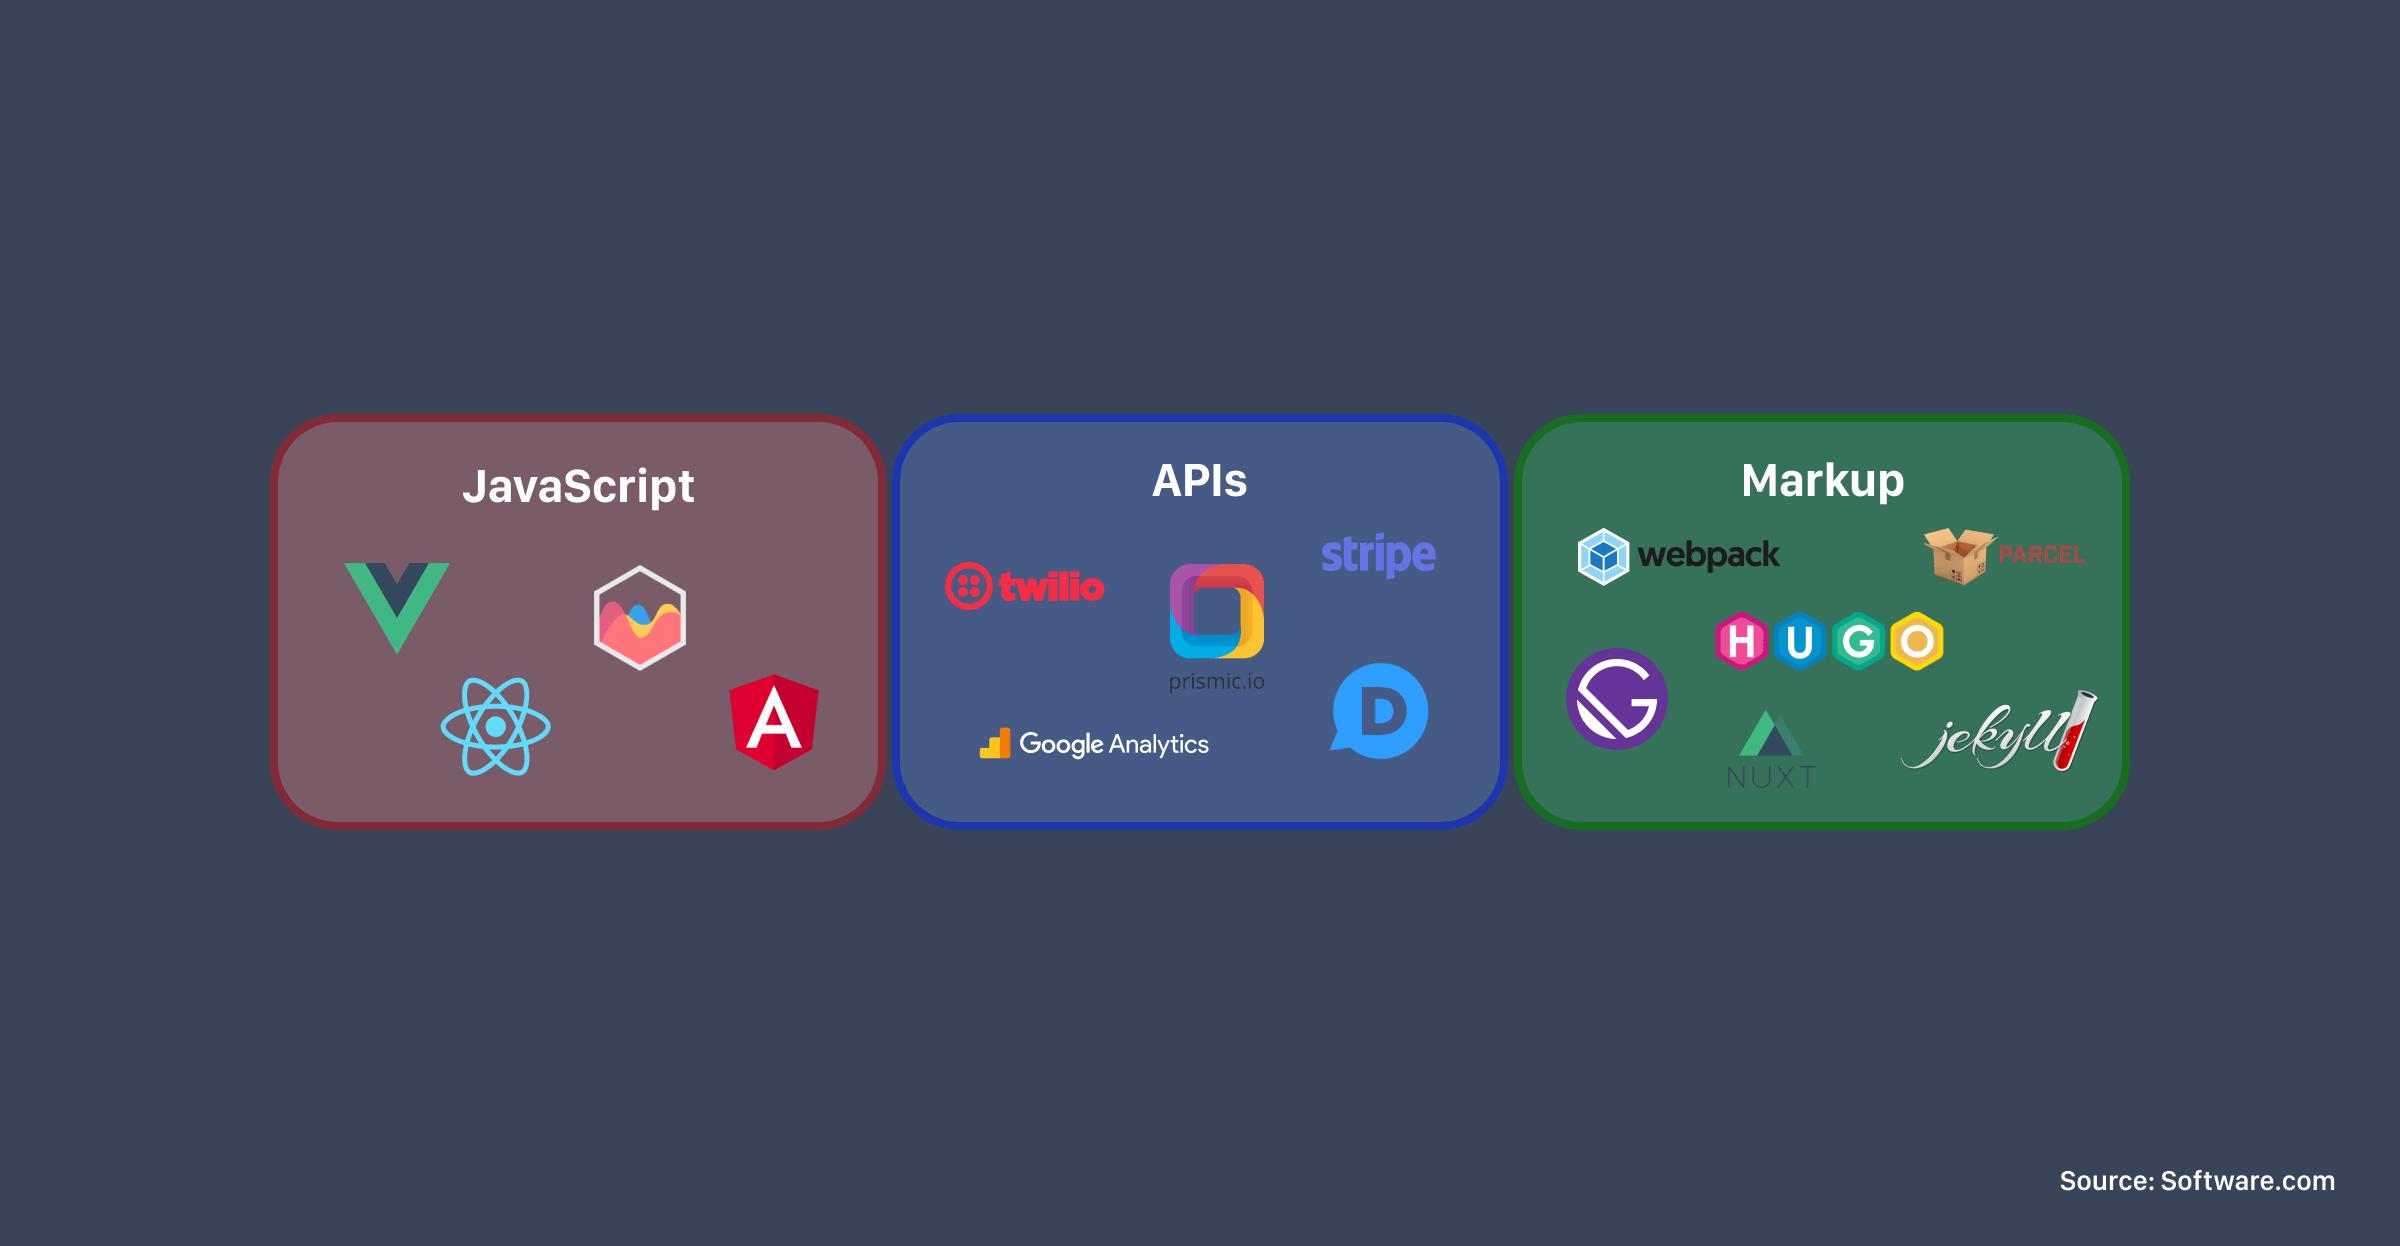 JavaScript, APIs, and Markup make up the JAMstack, including tools like Vue, React, Angular, Gatsby, Webpack, Jekyll, Hugo, Nuxt, and more.